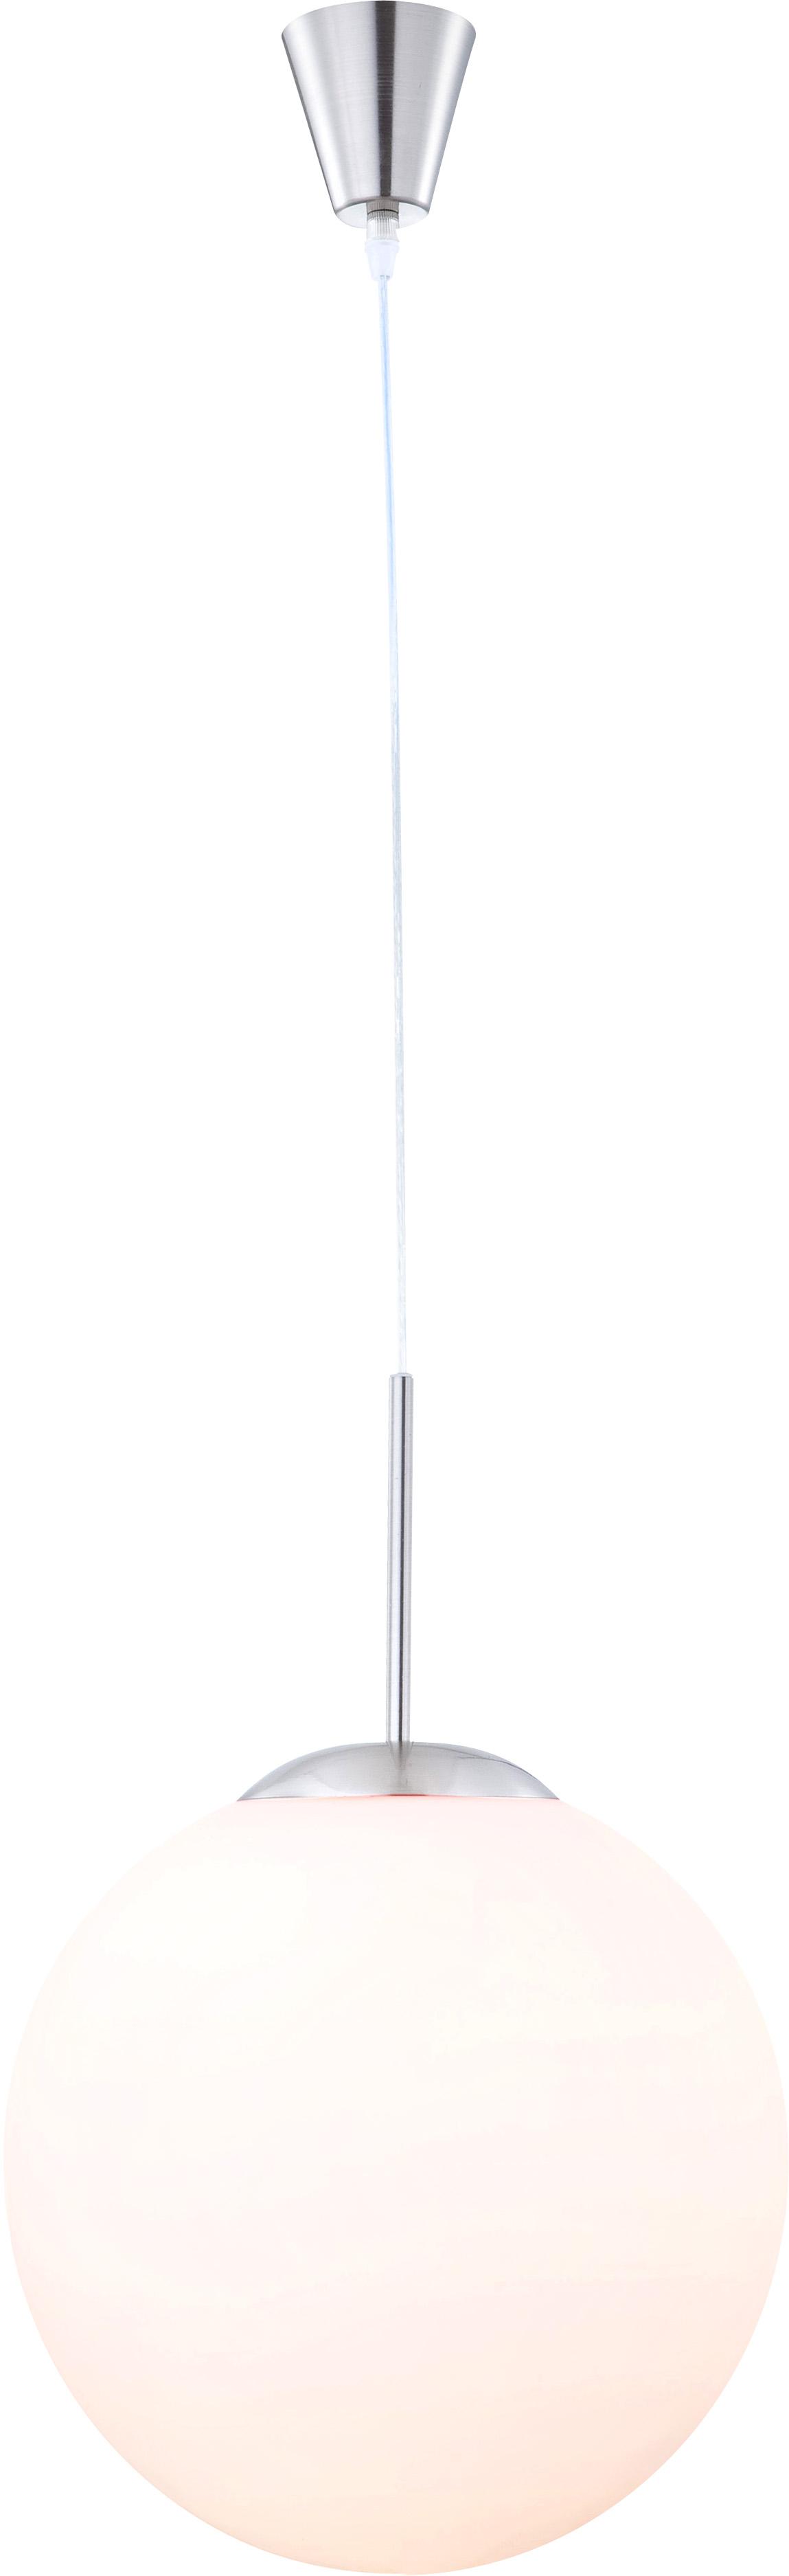 balla schlafzimmer r ume produkte globo lighting leuchten lampen online kaufen. Black Bedroom Furniture Sets. Home Design Ideas